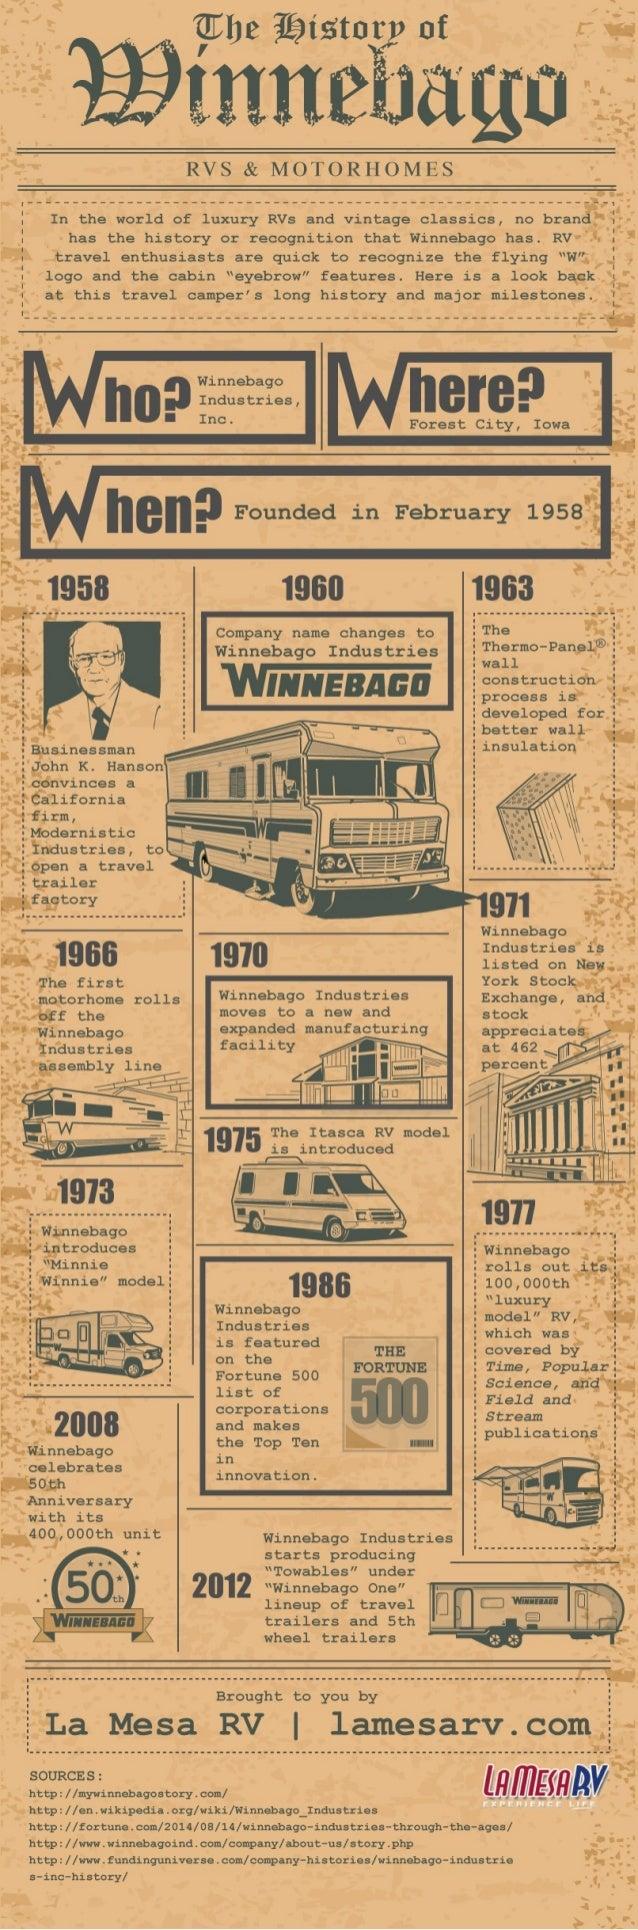 The History of Winnebago RVs & Motorhomes | La Mesa RV